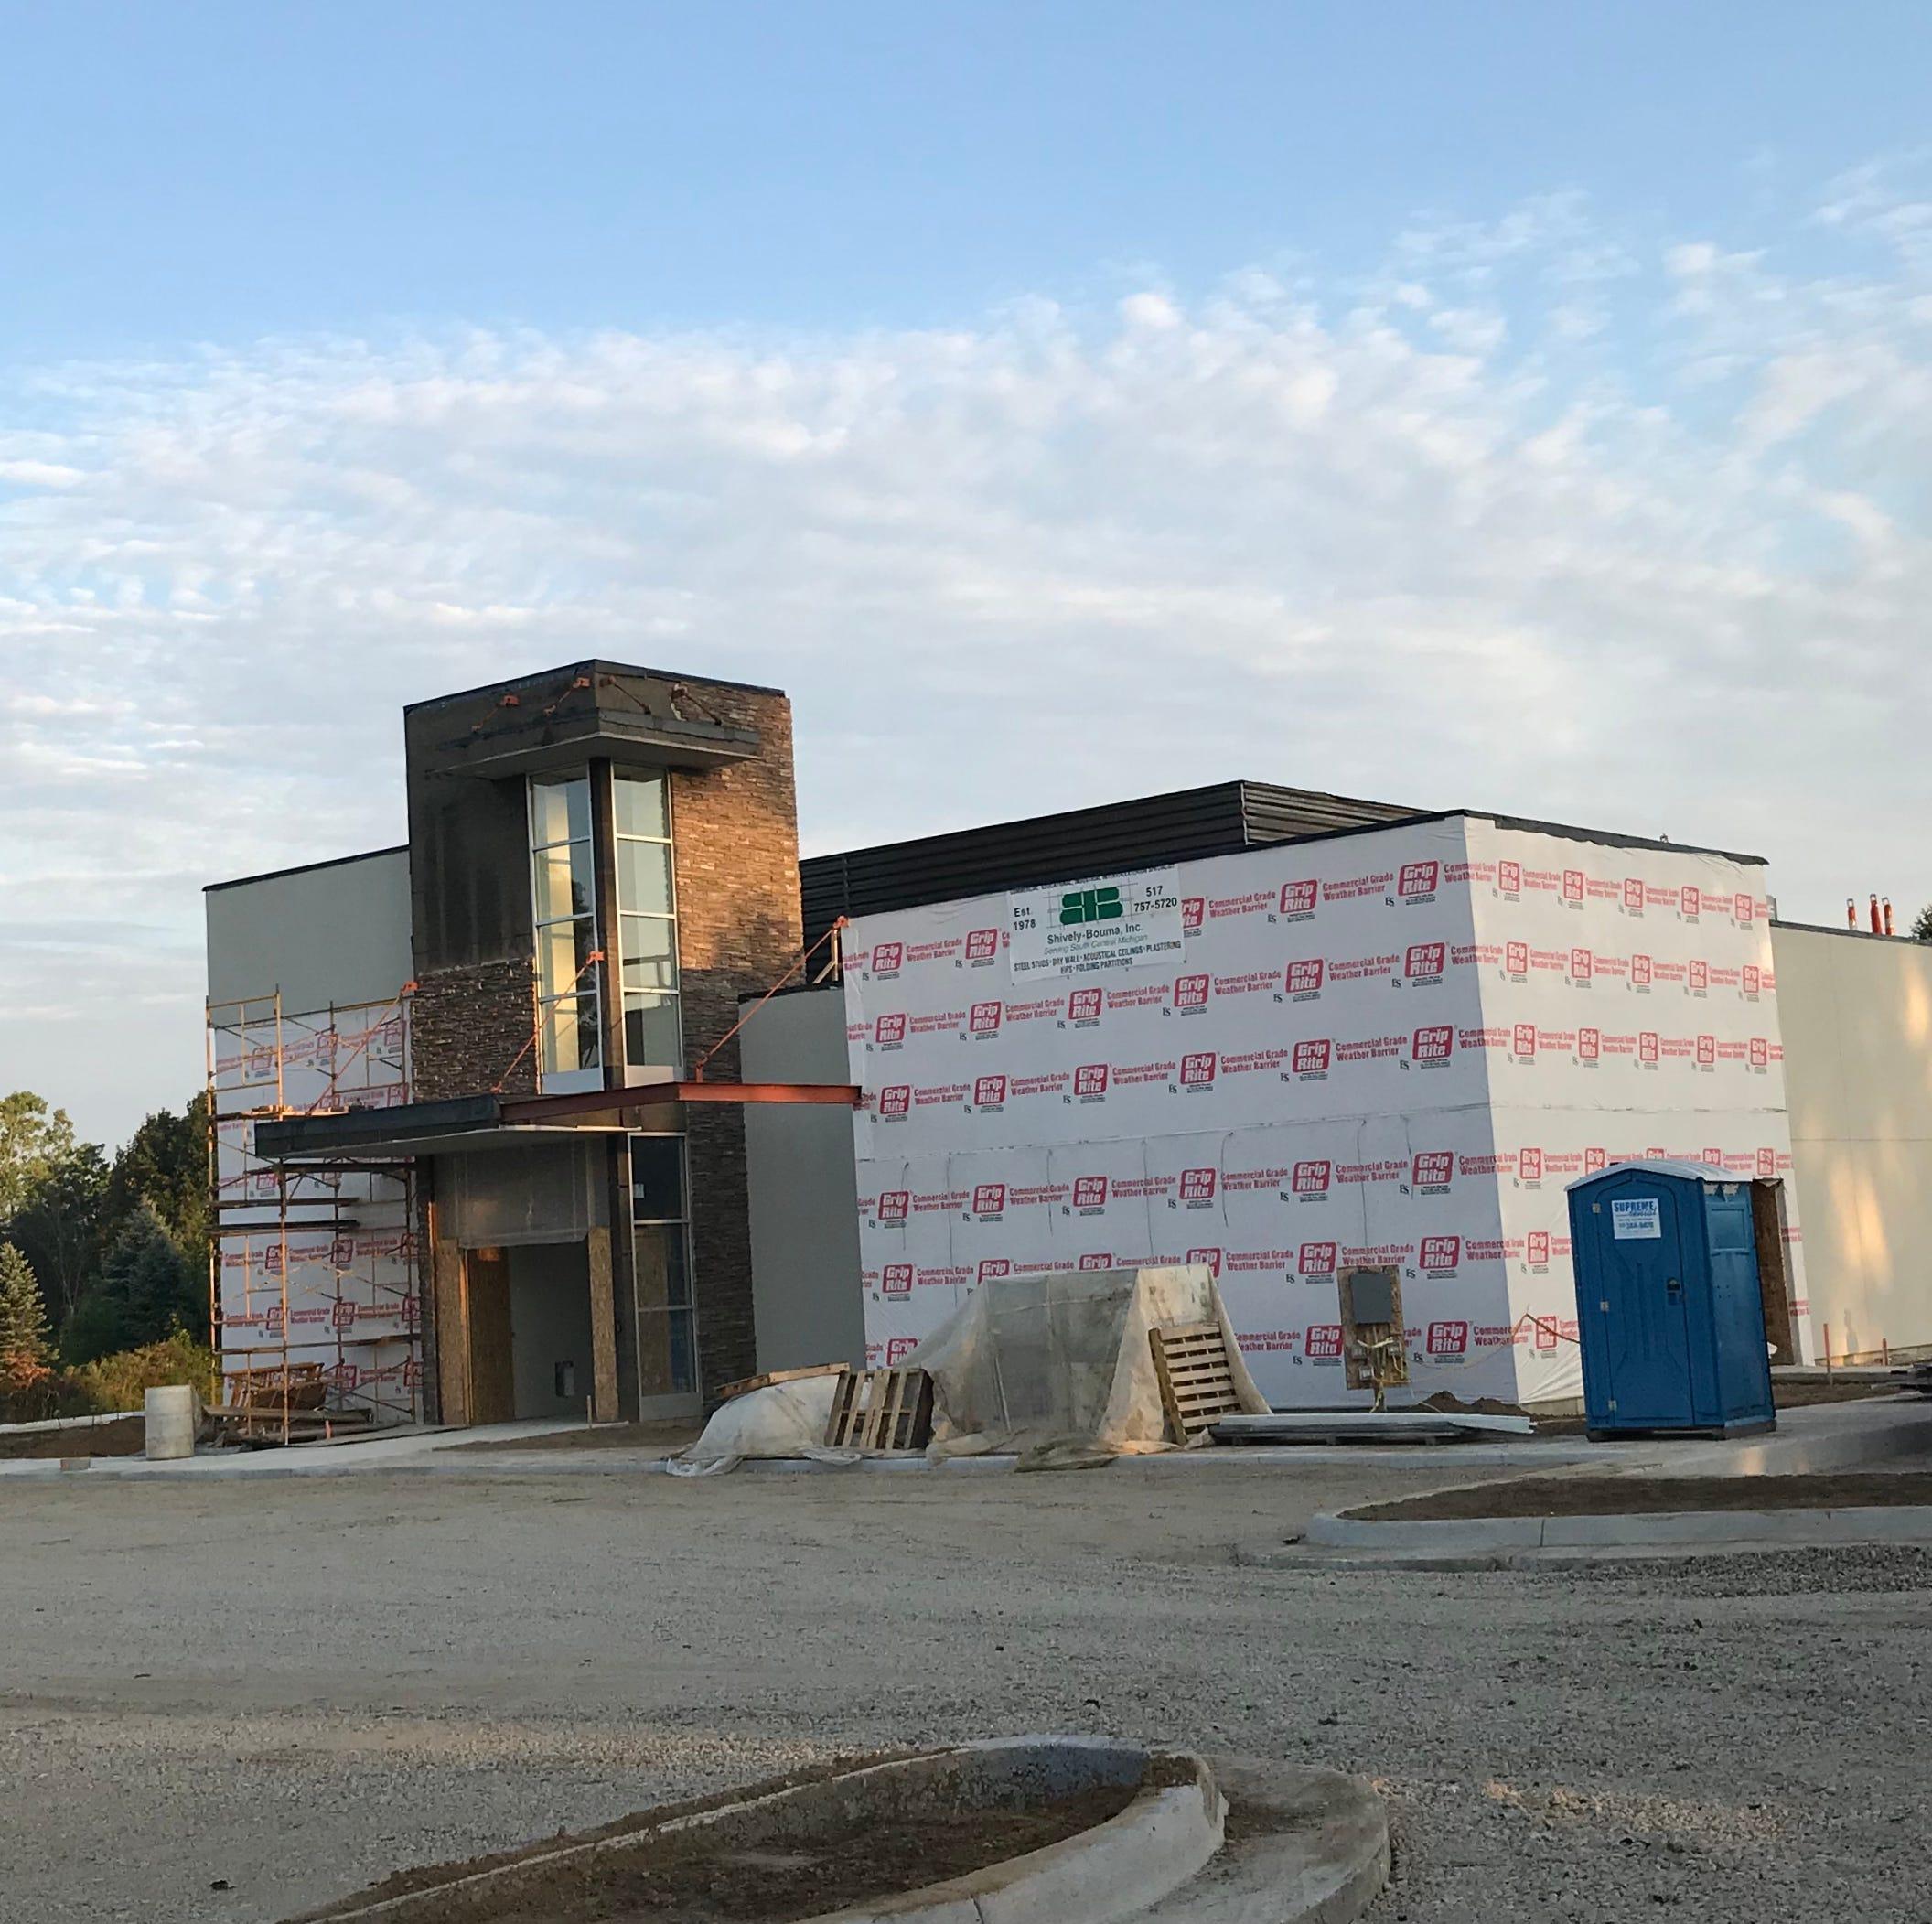 Klavon's Pizzeria & Pub taking shape in Mason, could open in January